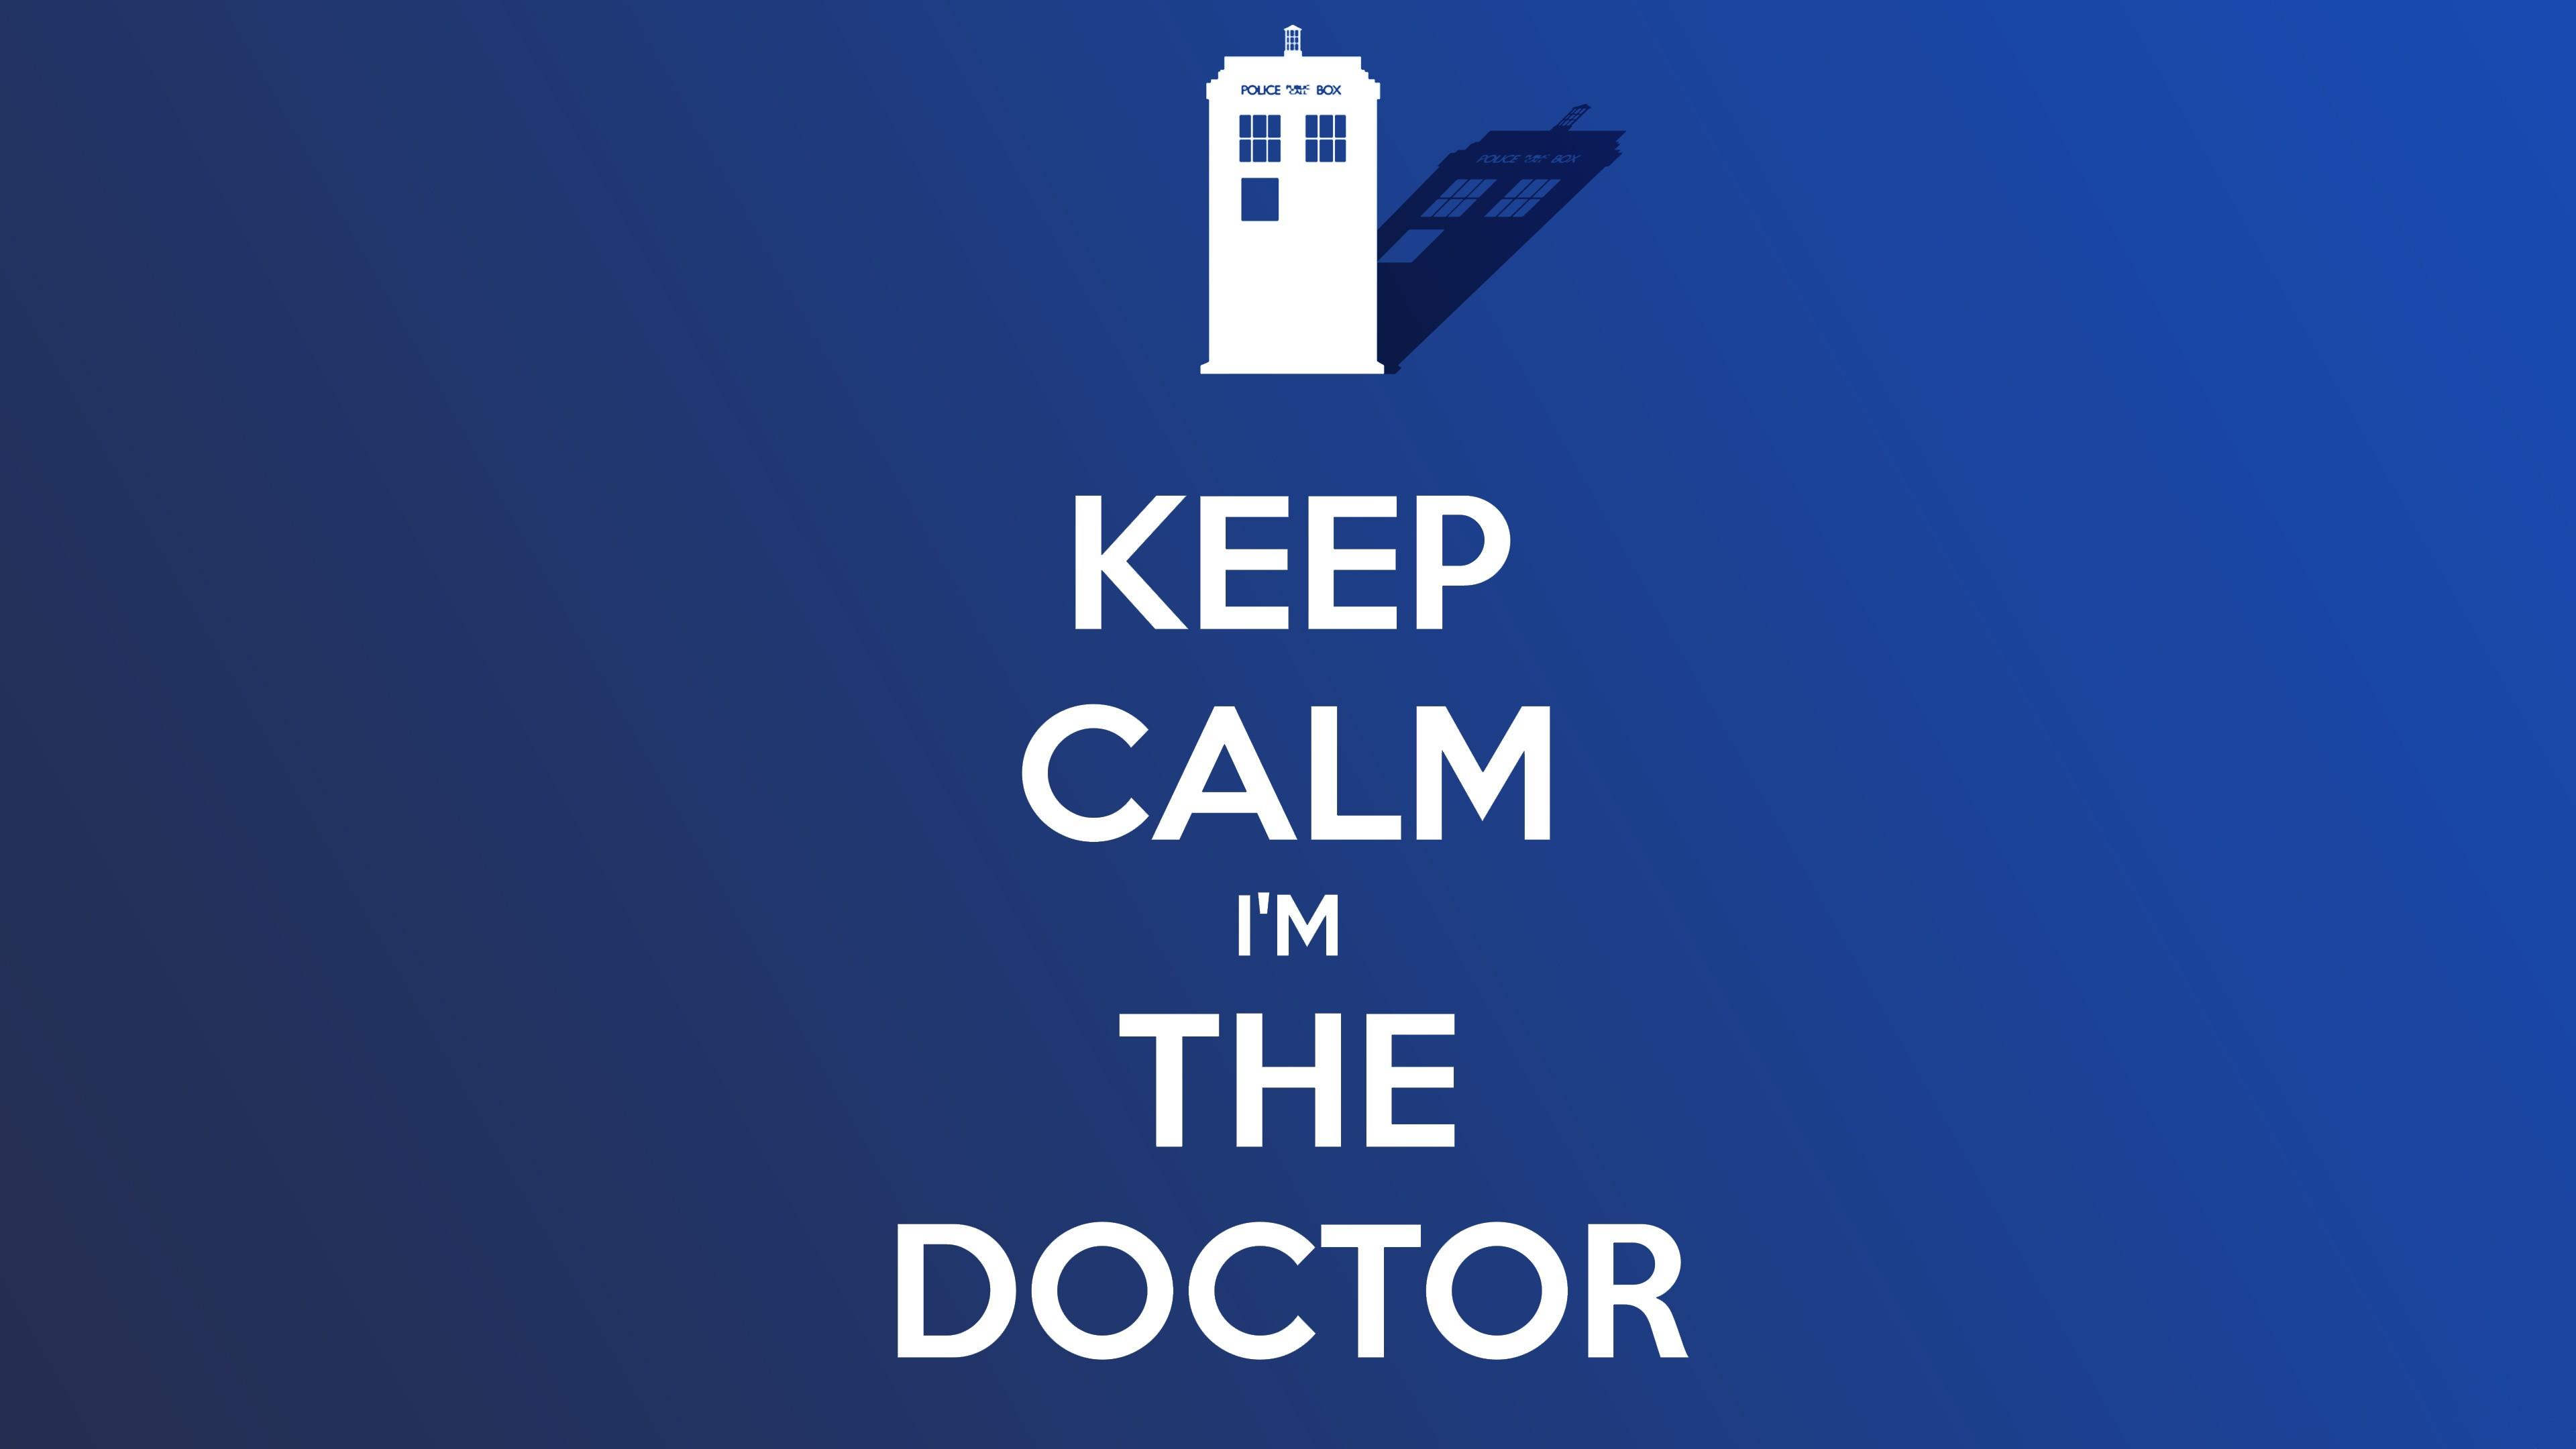 Wallpaper : text, logo, Doctor Who, TARDIS, Keep Calm and